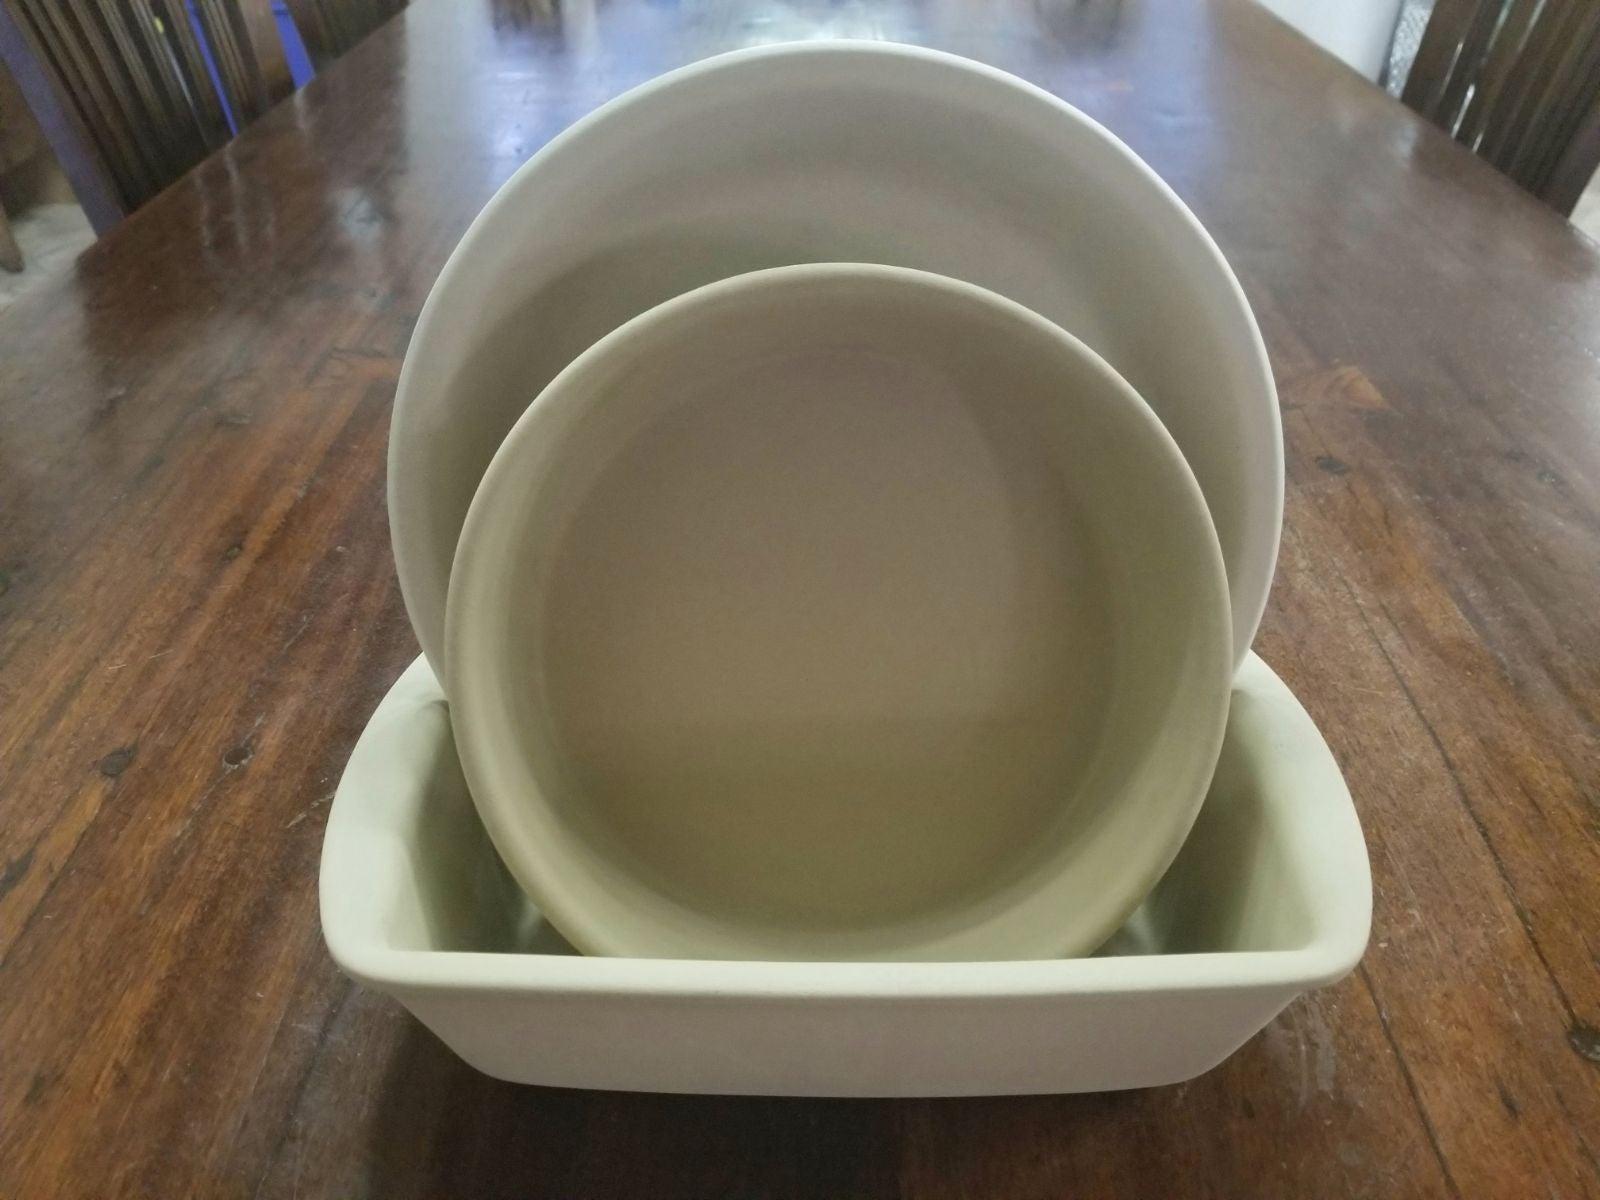 Pampered Chef Stoneware 3pc Baking Set